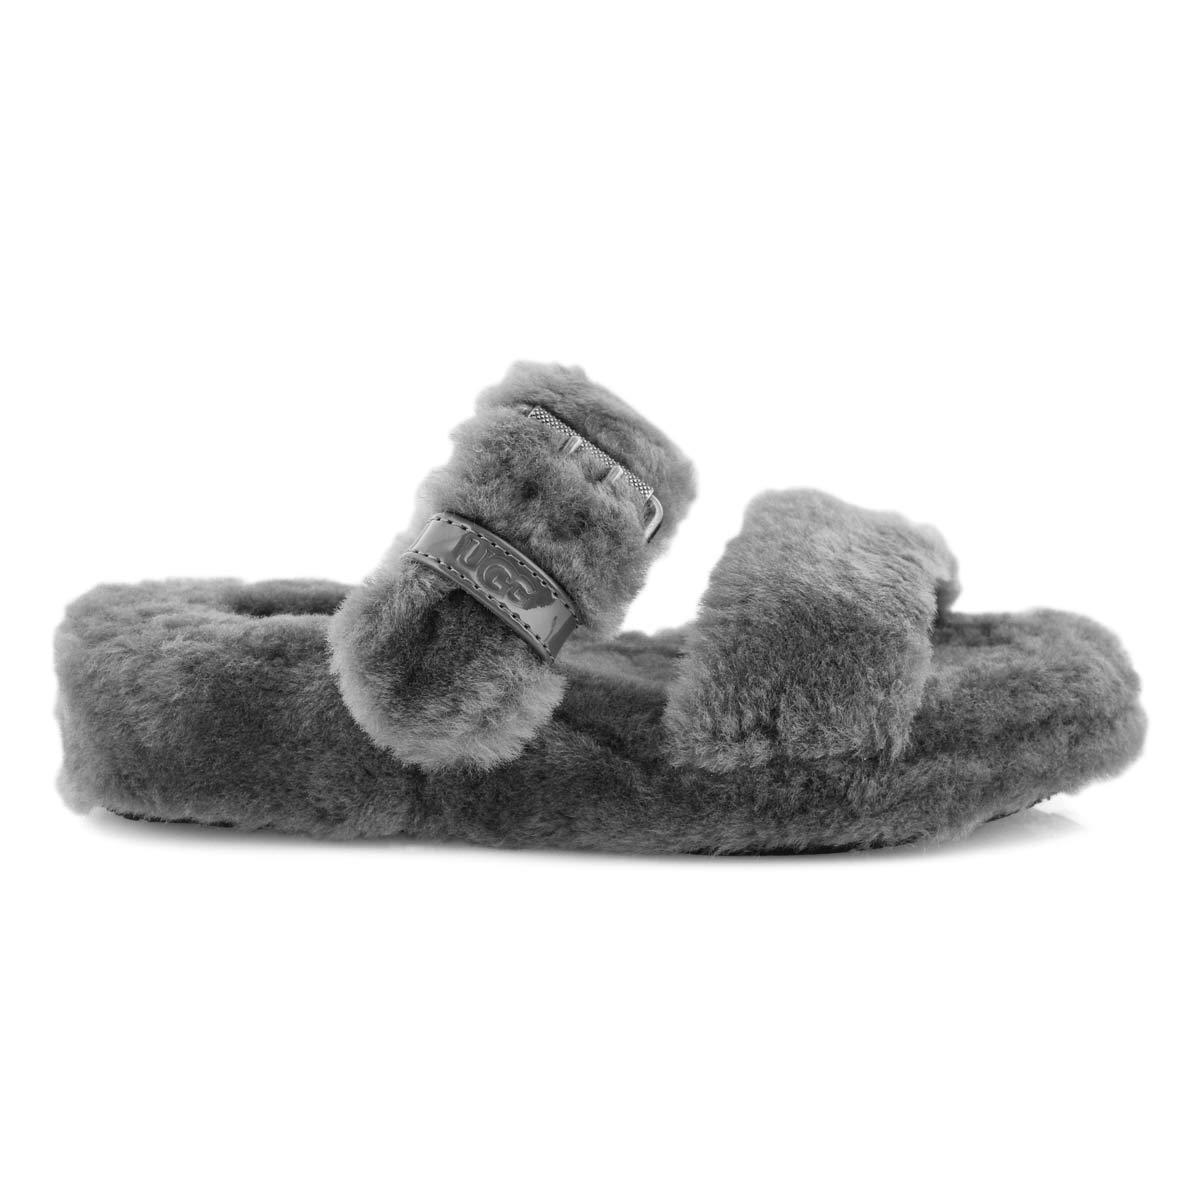 Lds Fuzz Yeah charcoal sheepskin slipper